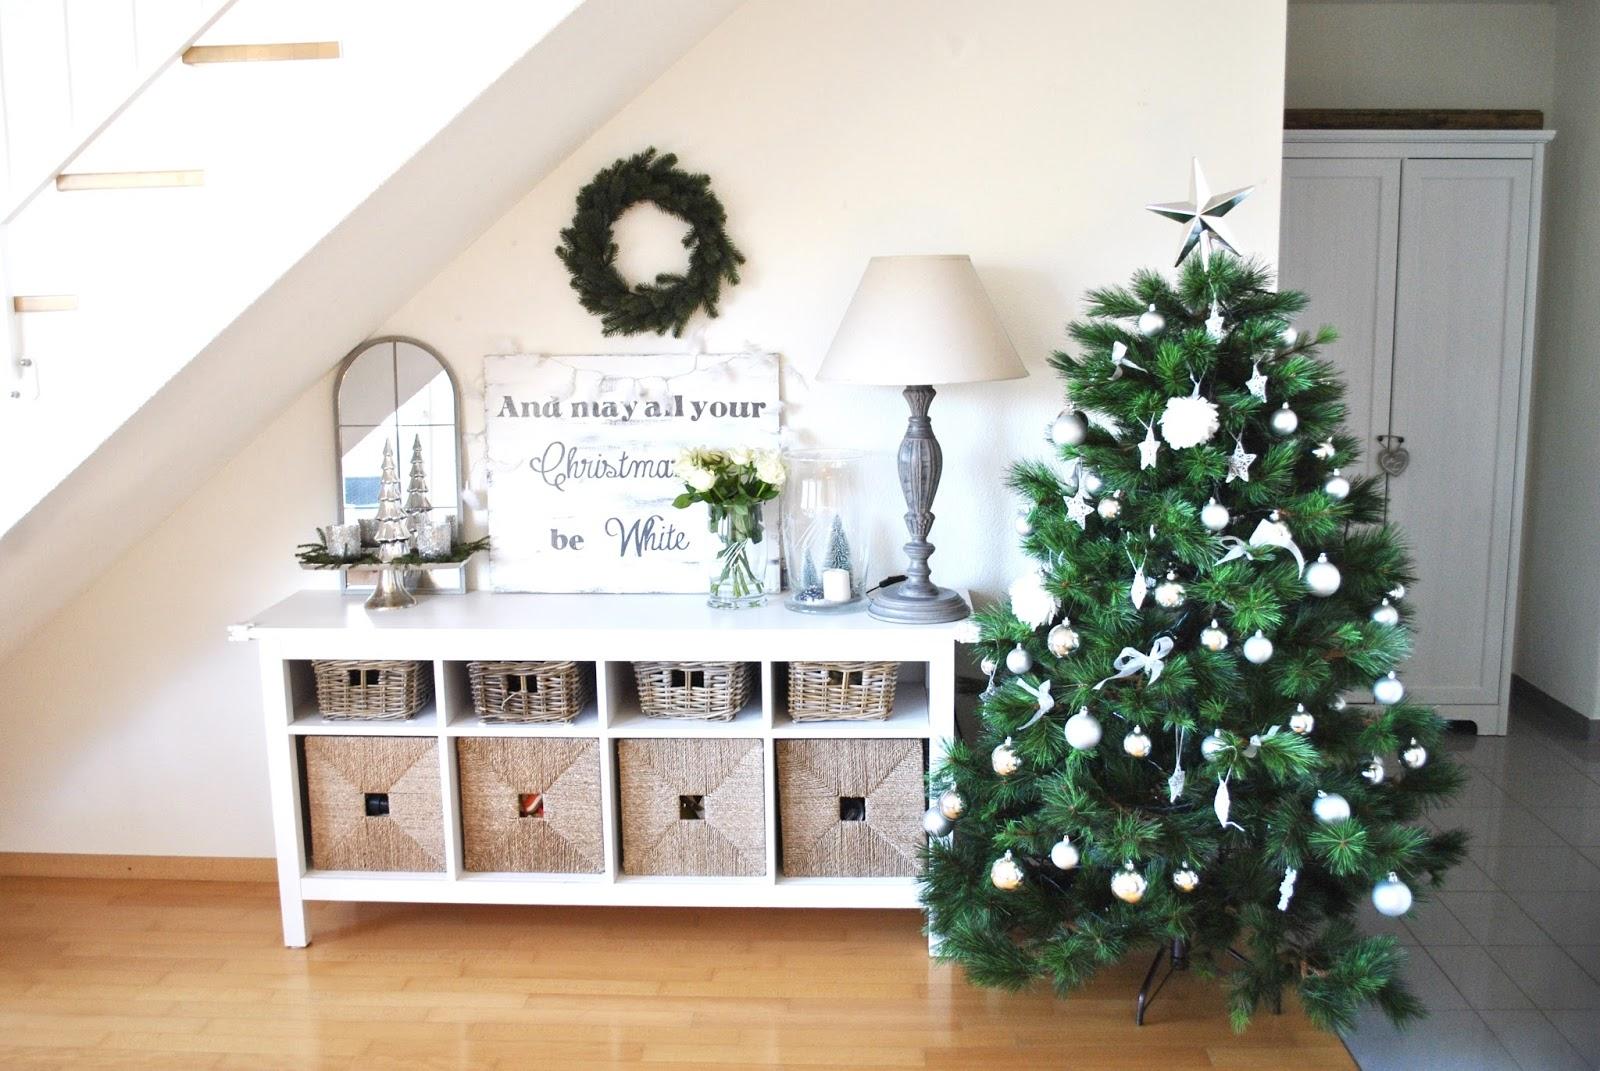 Candelabri Maison Du Monde le mie decorazioni natalizie 2015 - sara and catherine's tales